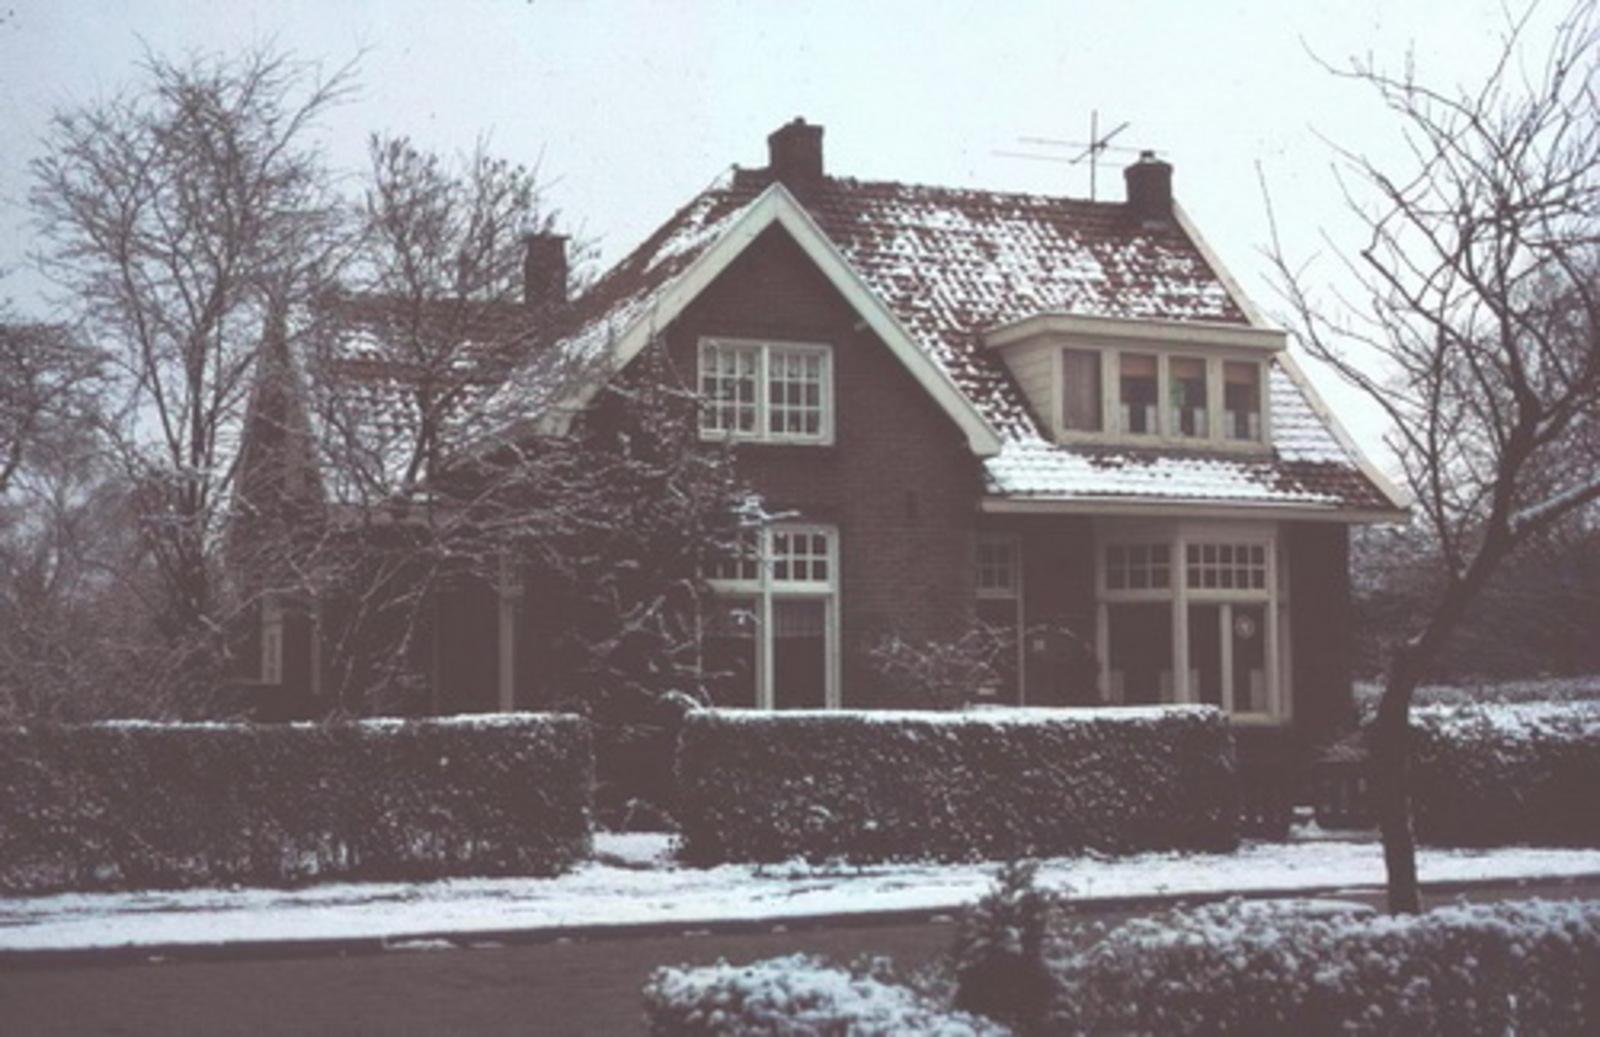 Nieuweweg W 0083-81 197_ Huize vd Mey de Nijs